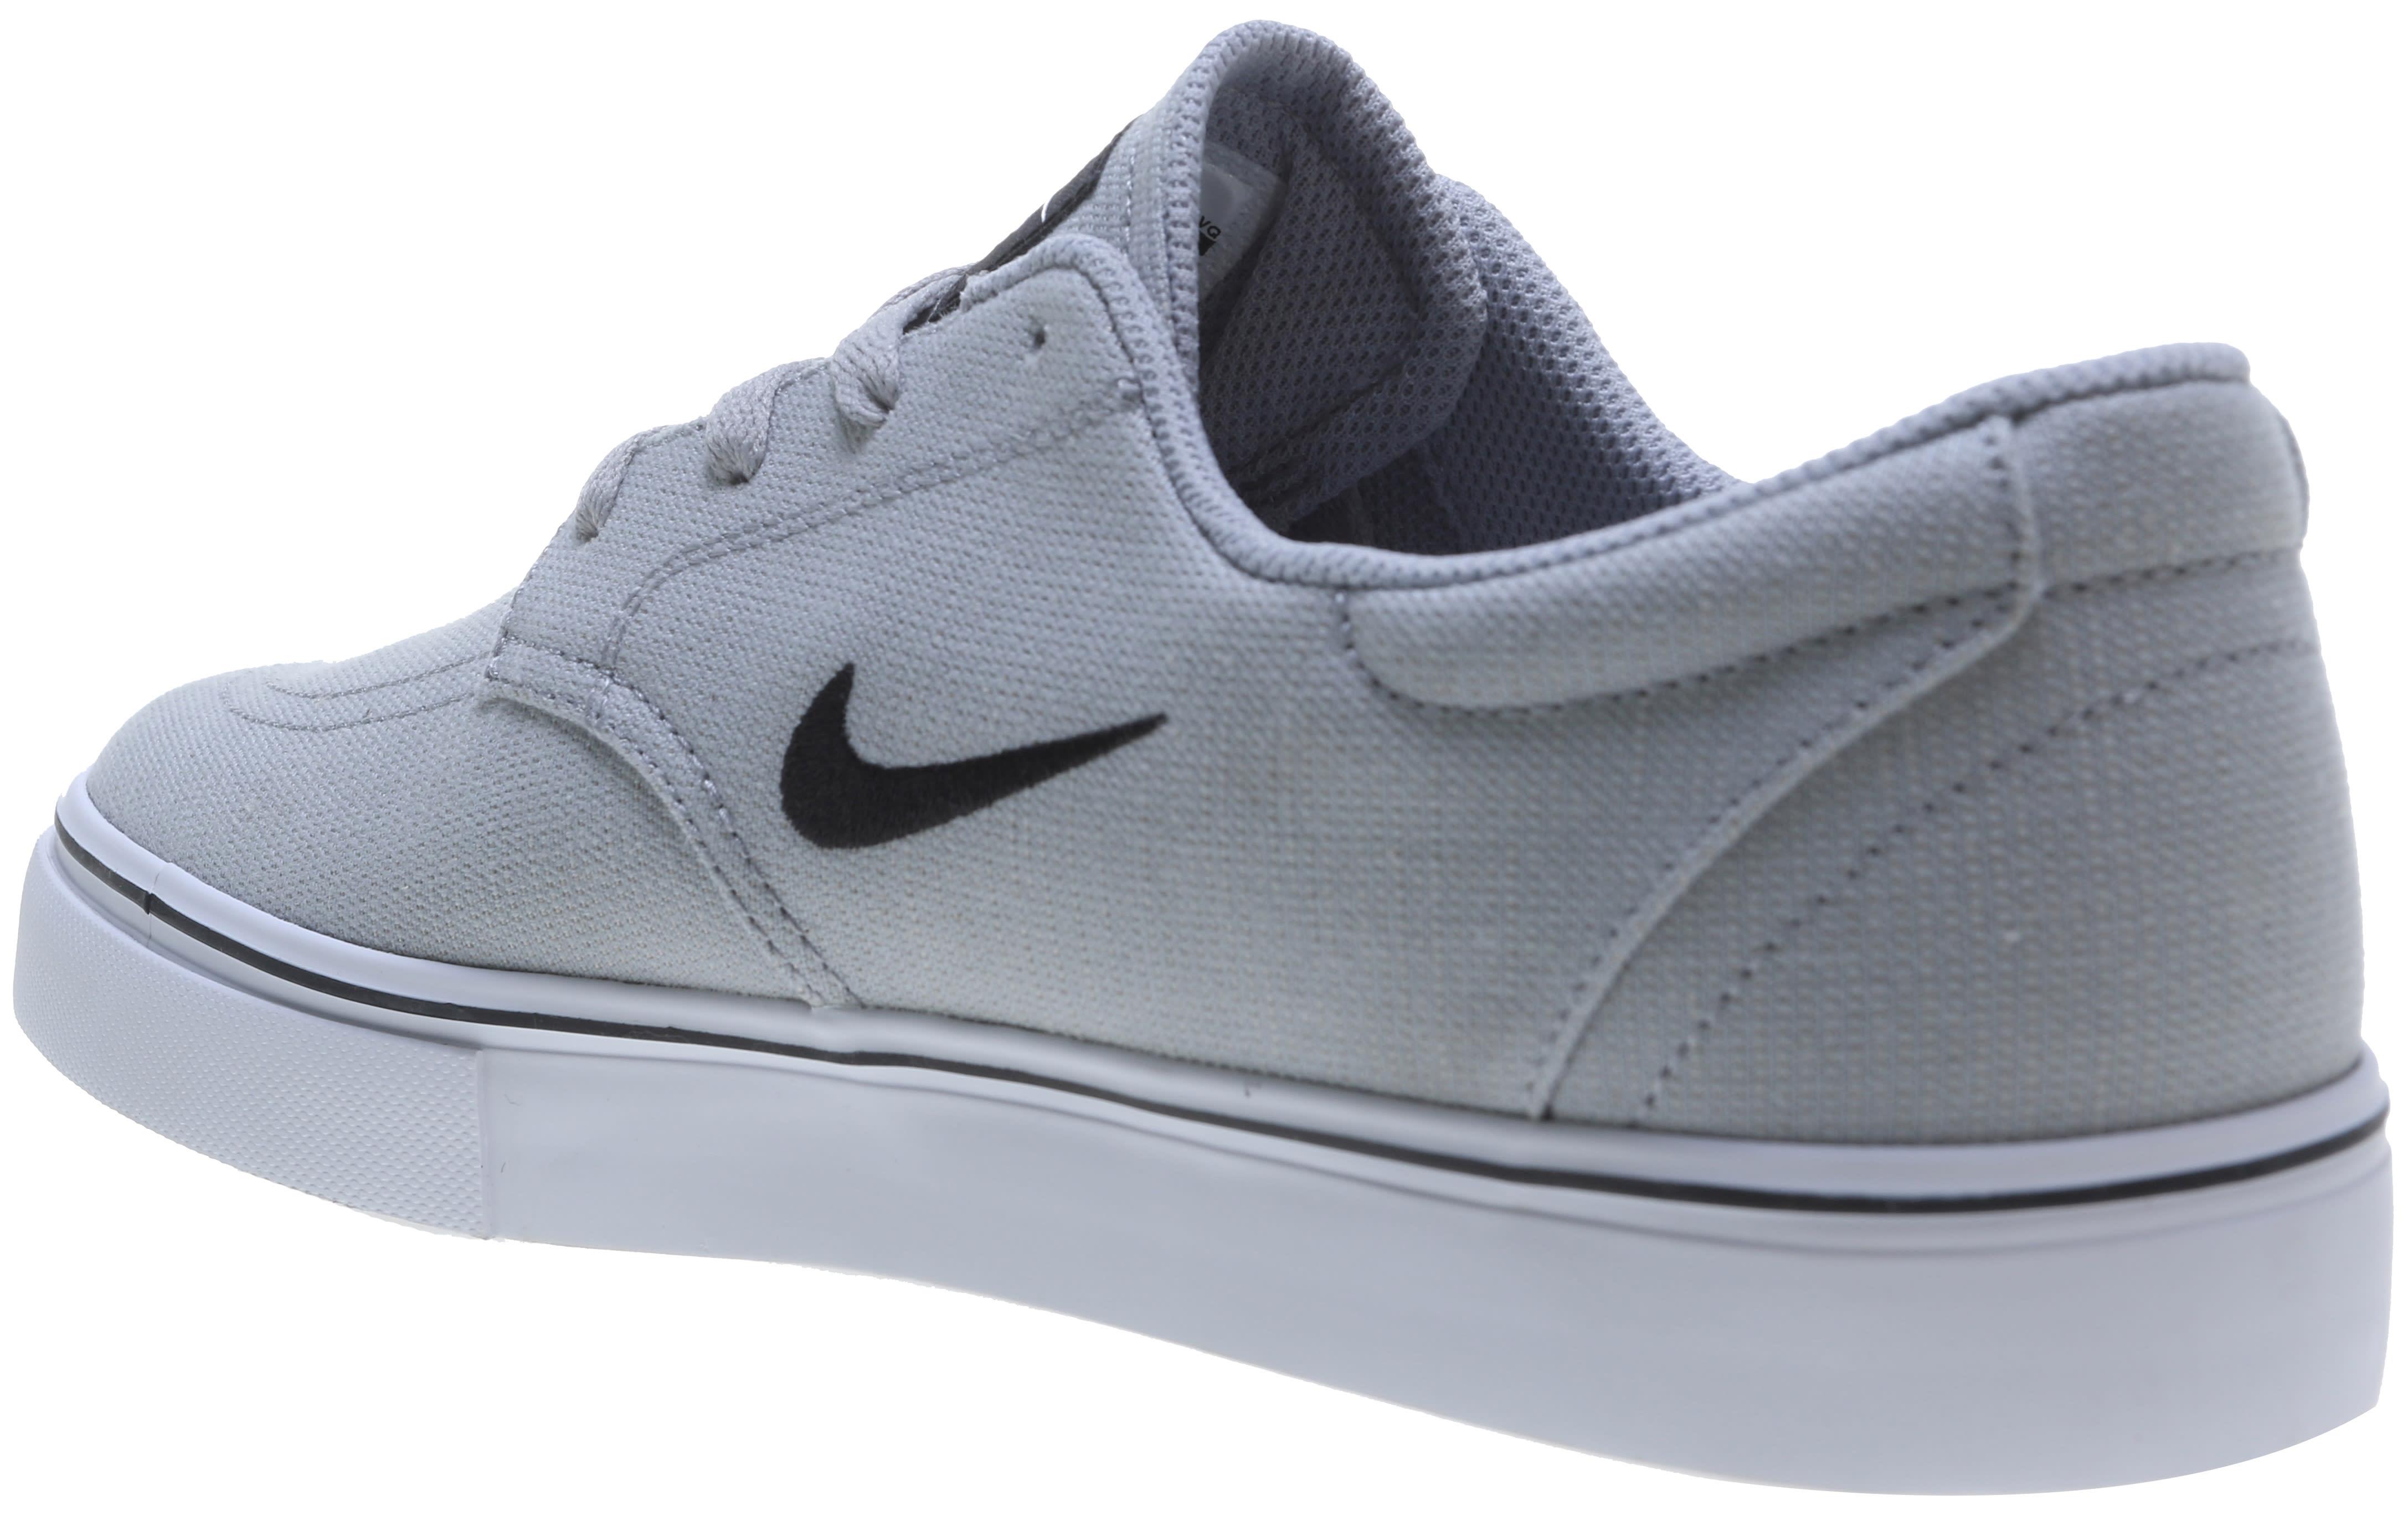 ad1cff098f11 Nike SB Clutch Skate Shoes - thumbnail 3